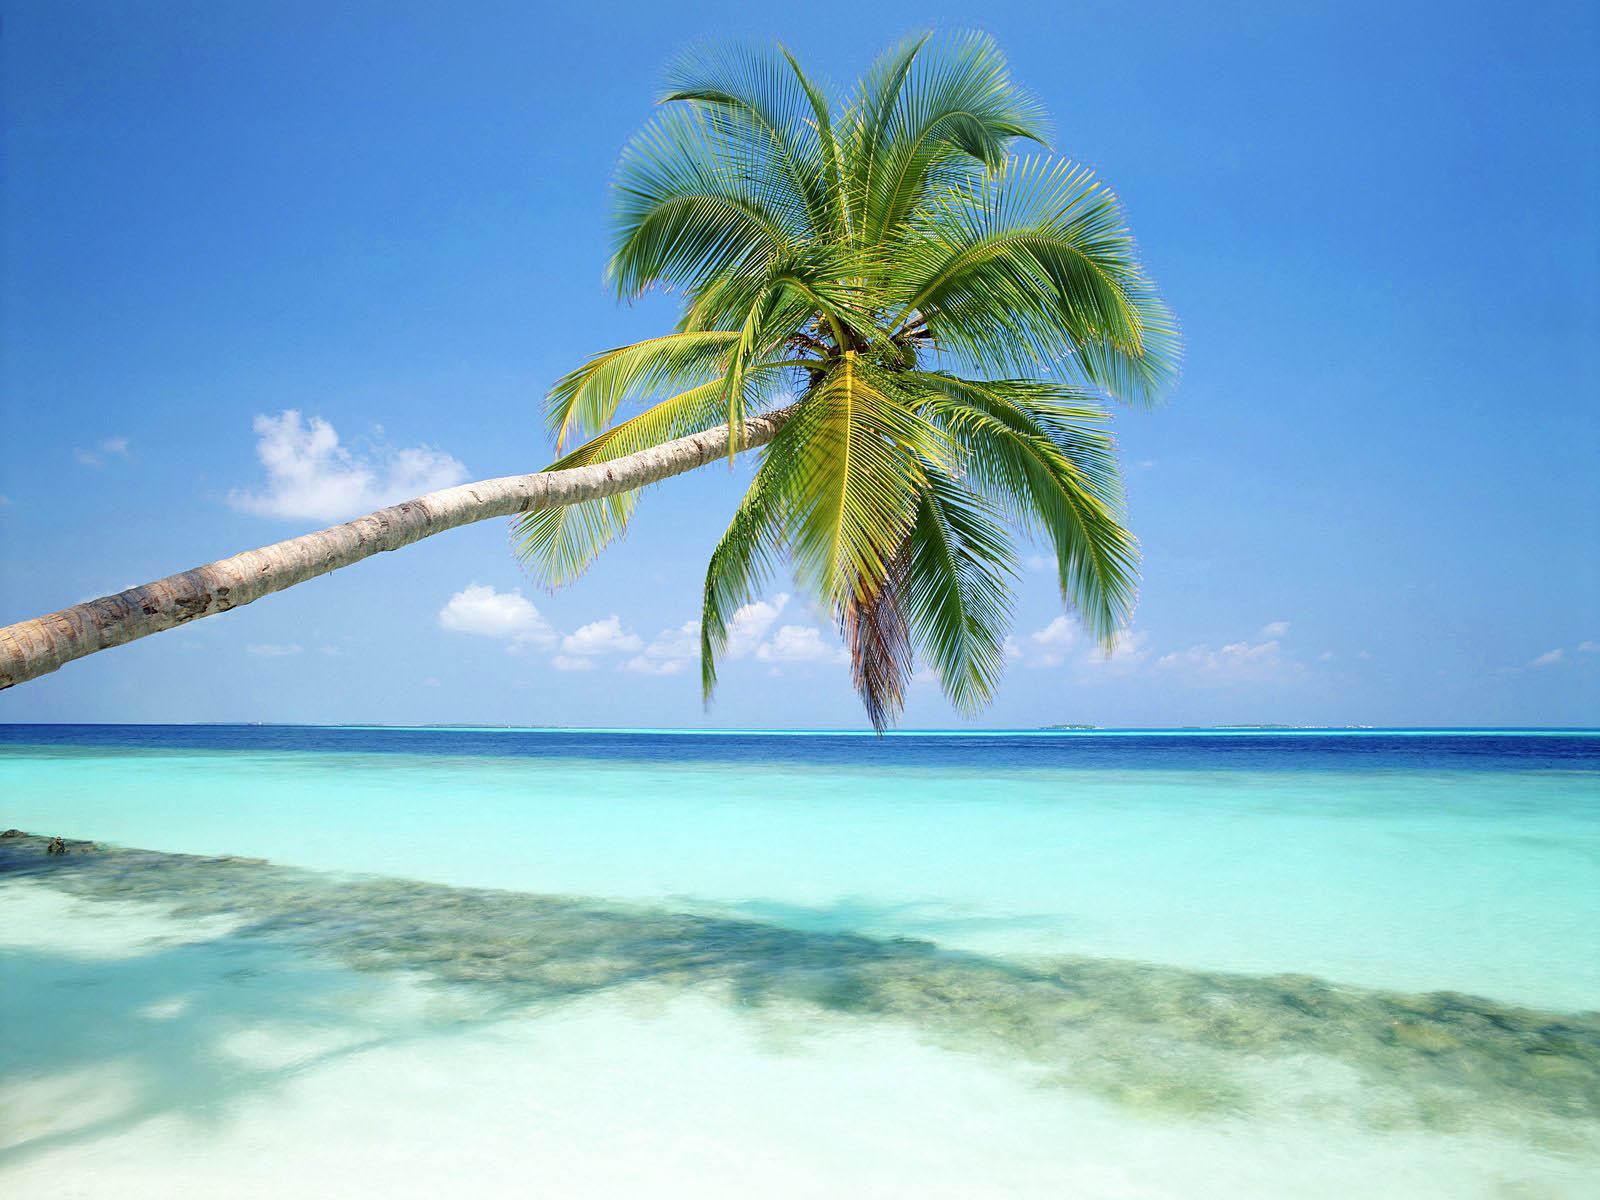 Wallpapers: Beach Desktop Wallpapers